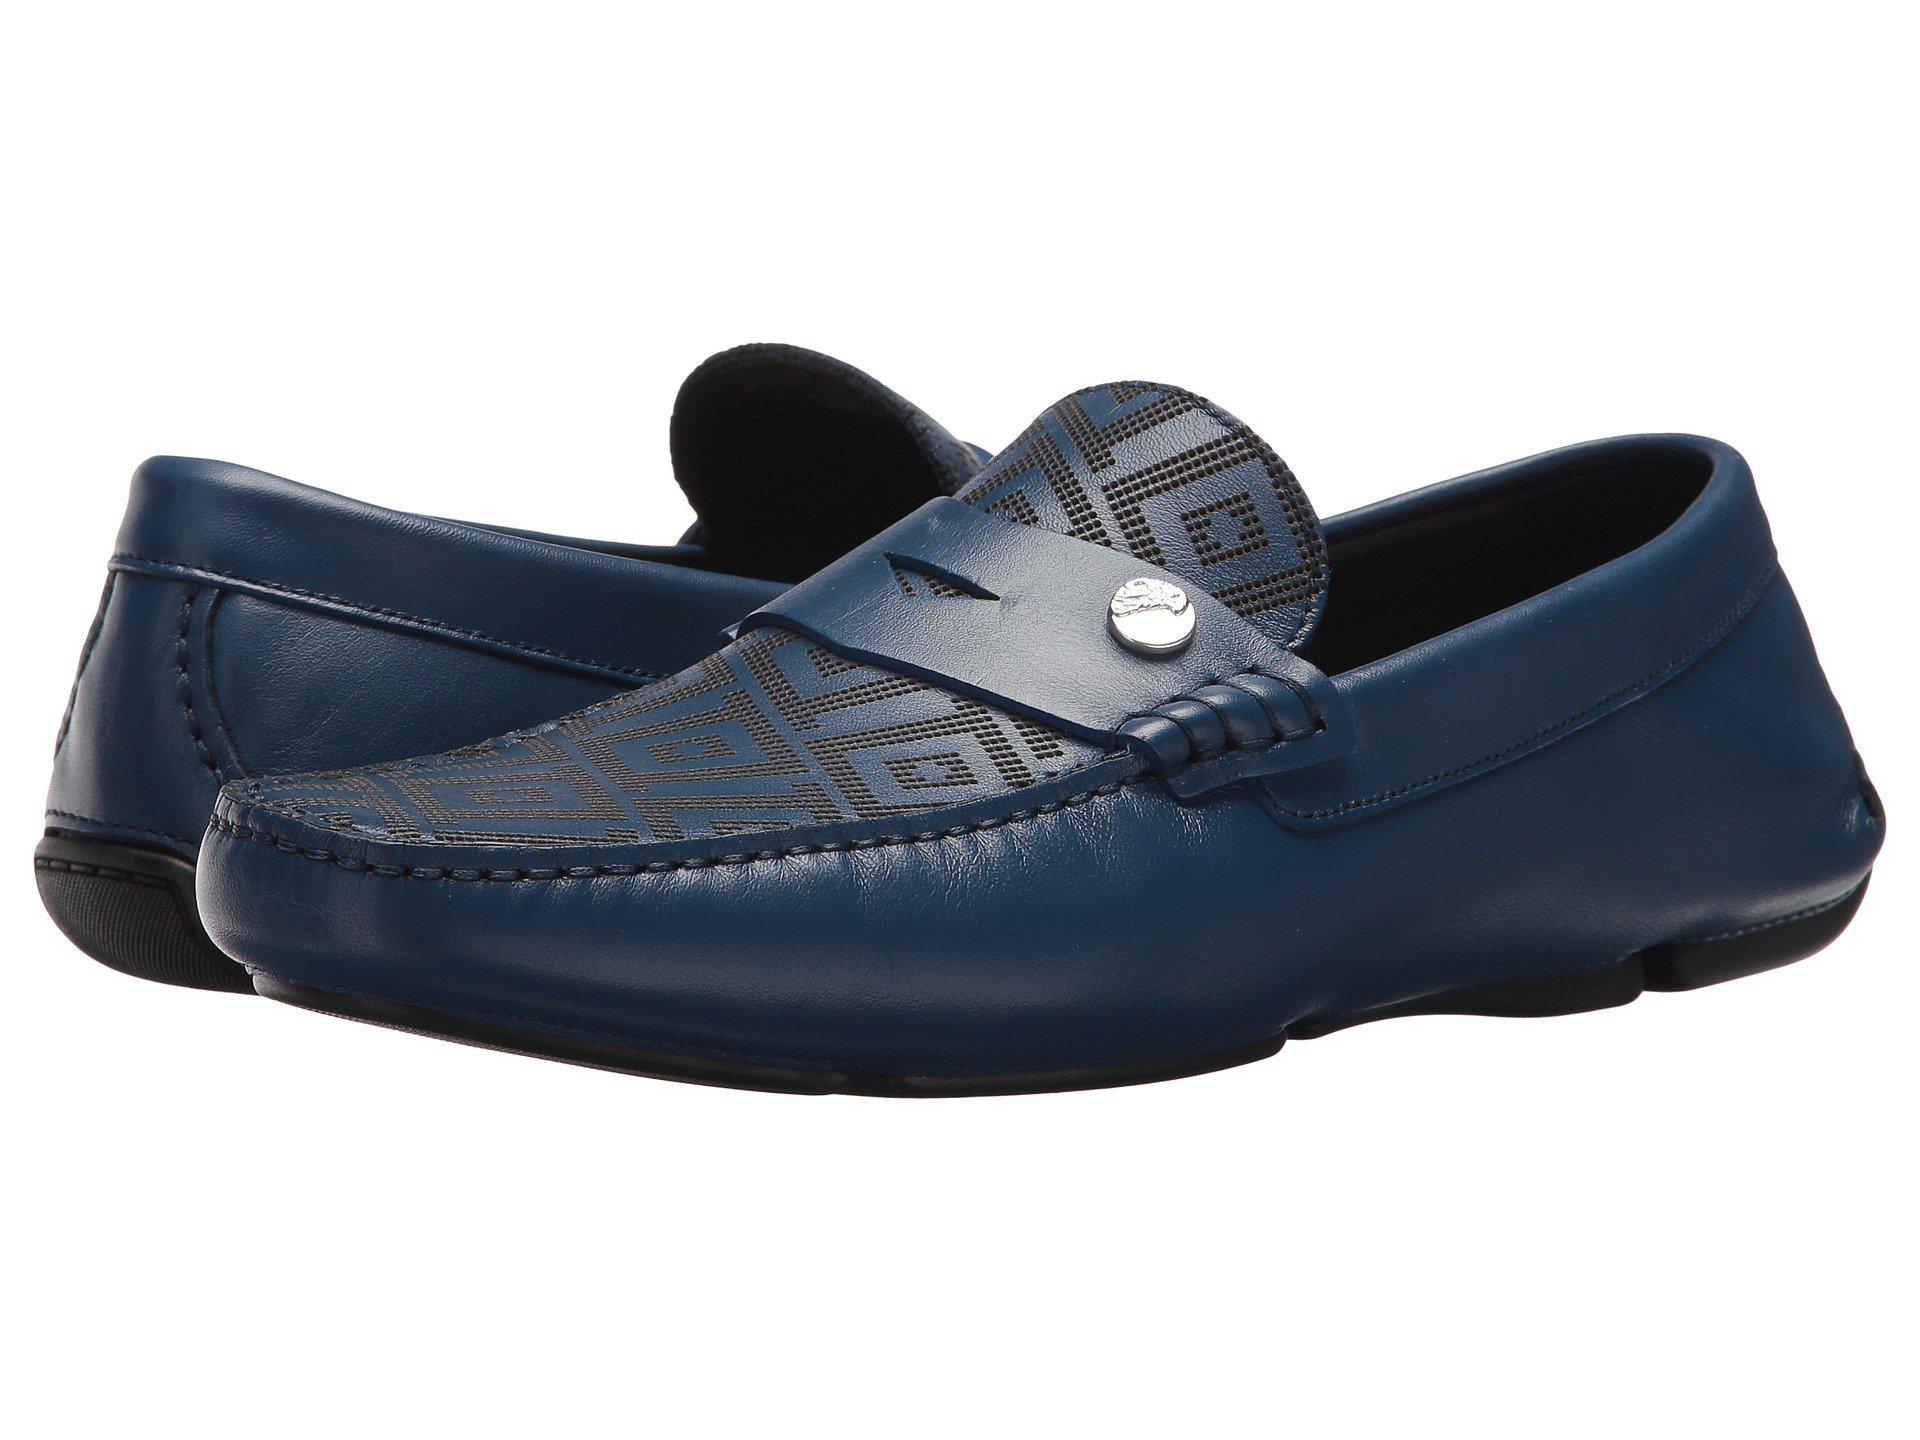 6b7c9010 Greca Embossed Driving Loafer (blue) Men's Shoes